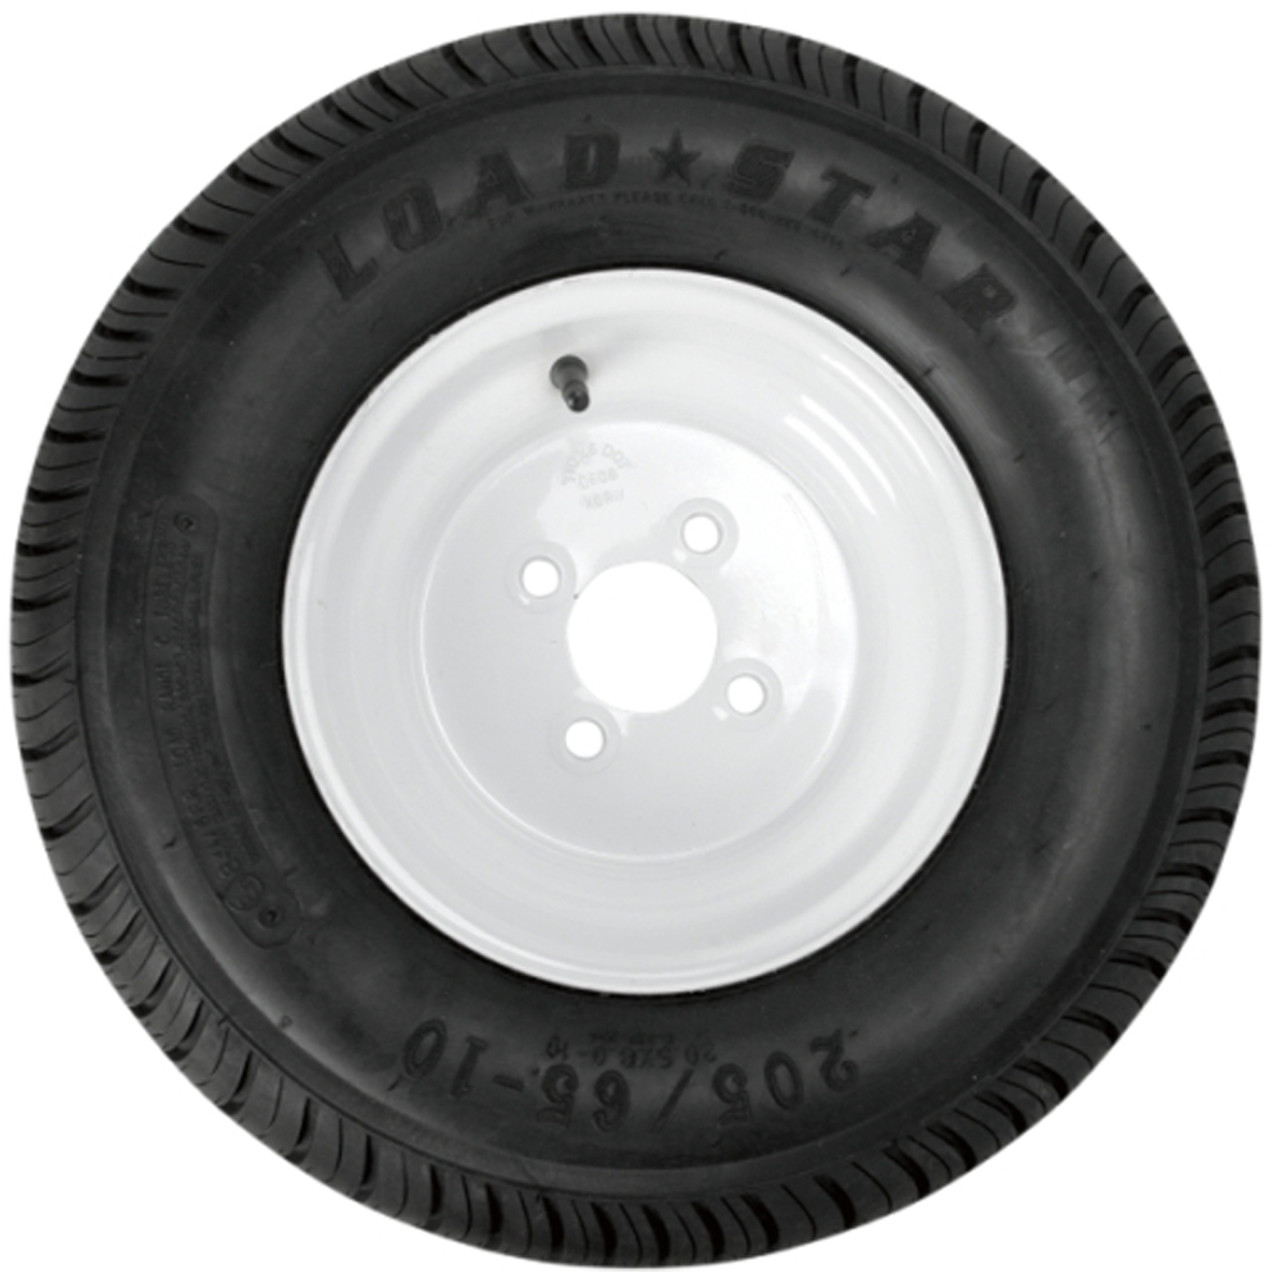 ATW30040 & ATW30153 Dolly Wheel & Tire